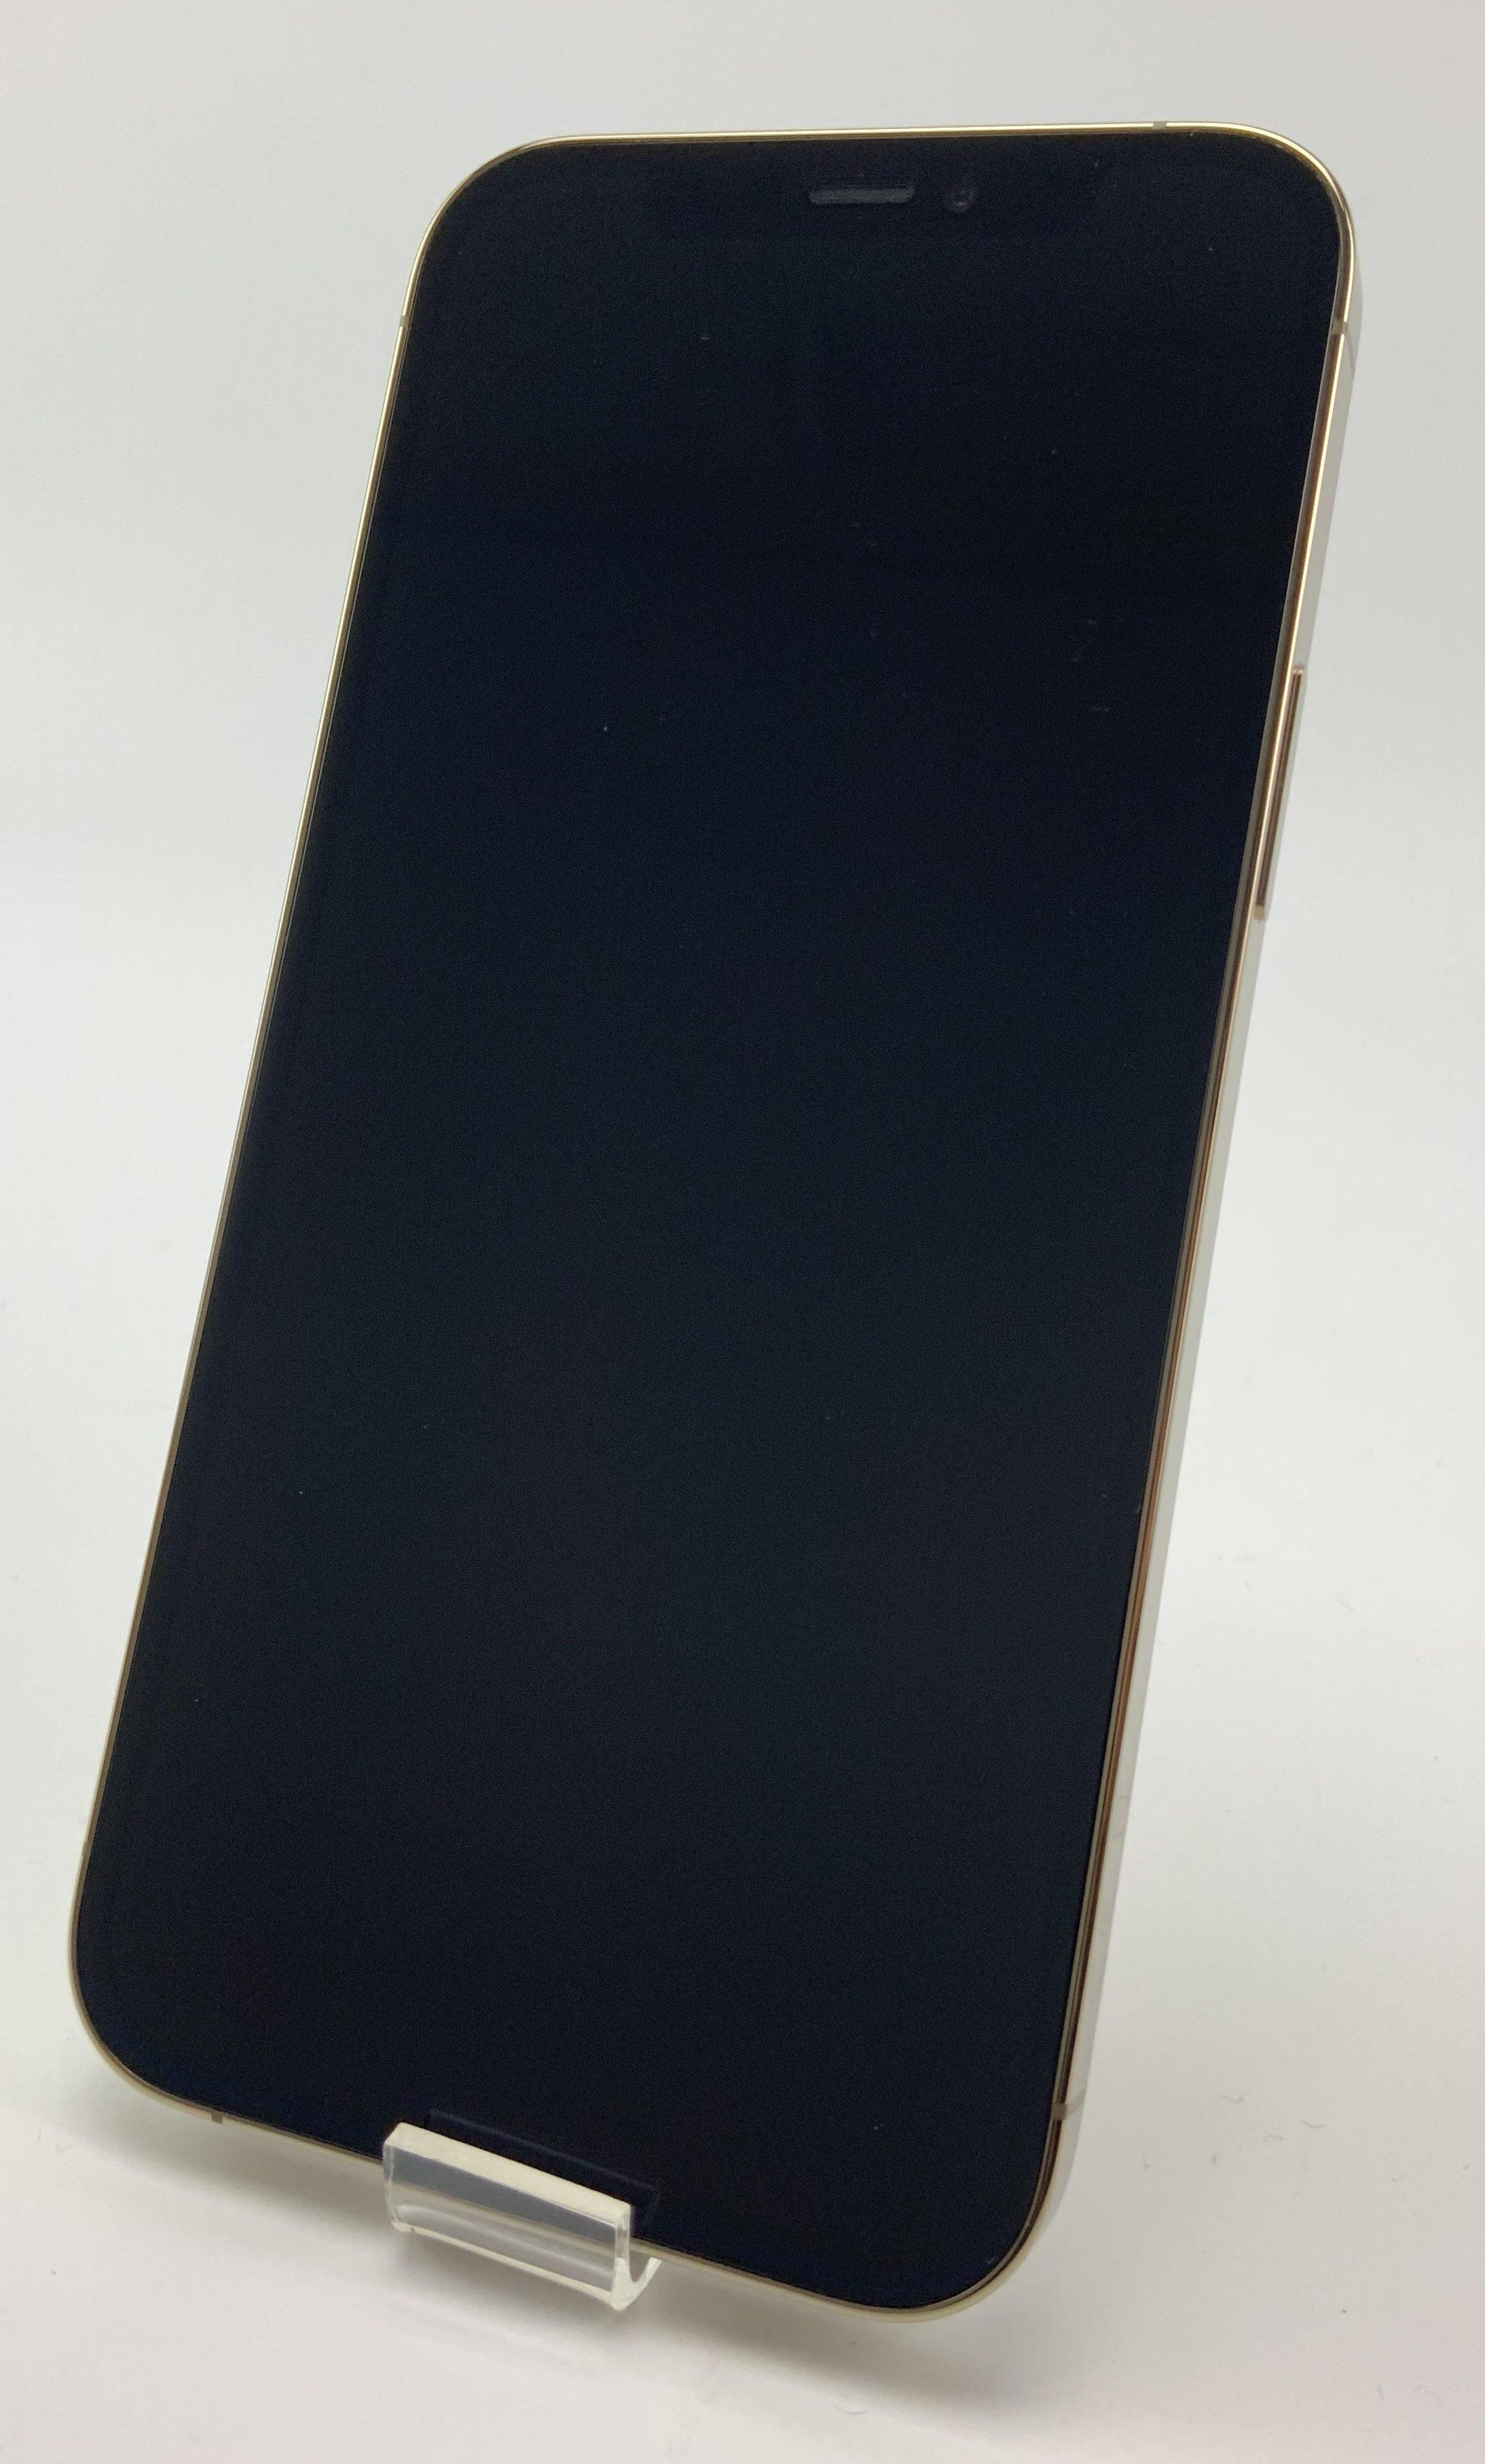 iPhone 12 Pro 256GB, 256GB, Gold, Bild 1